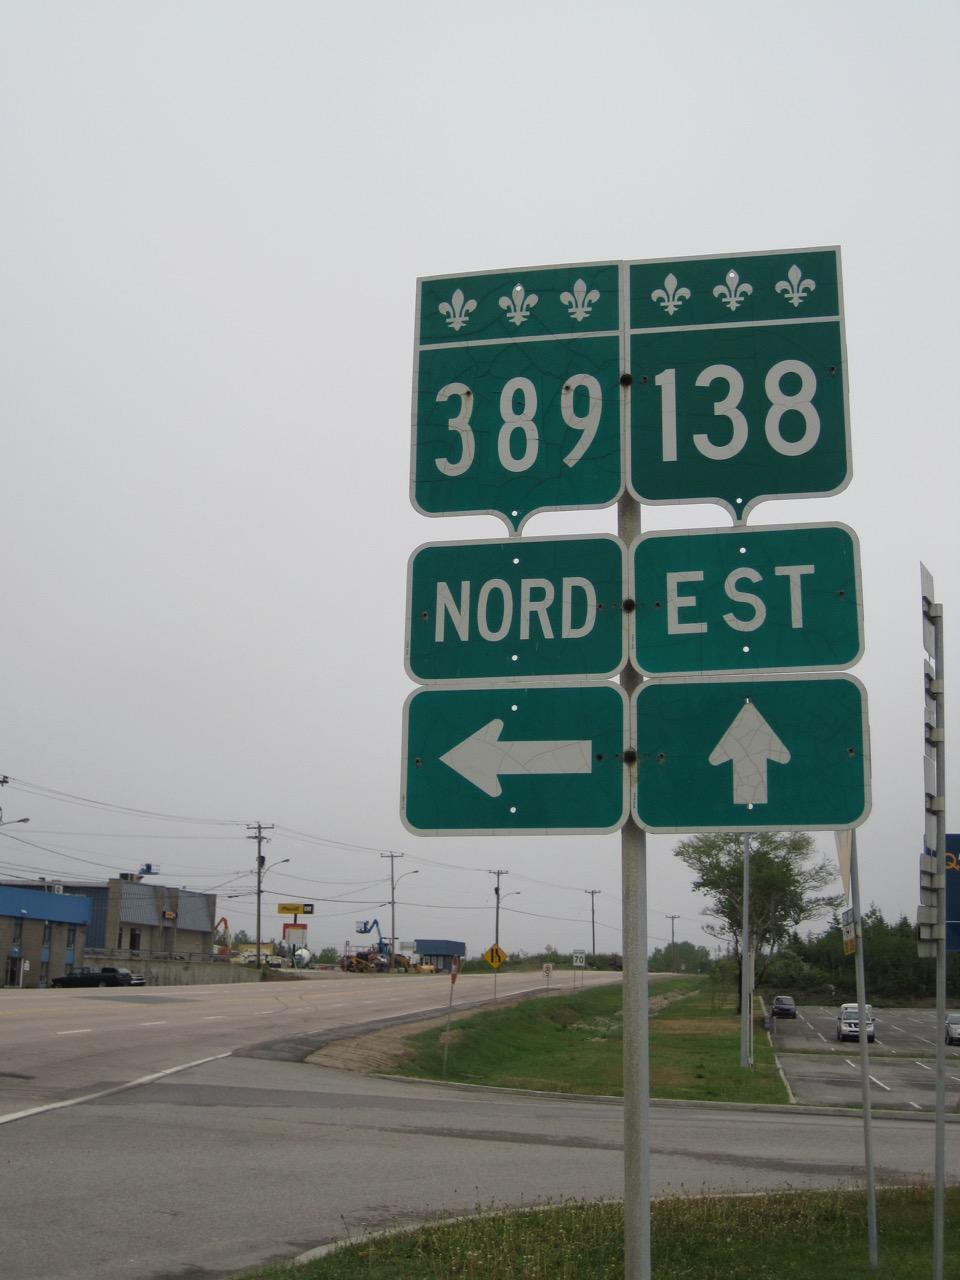 North Toward the Labrador